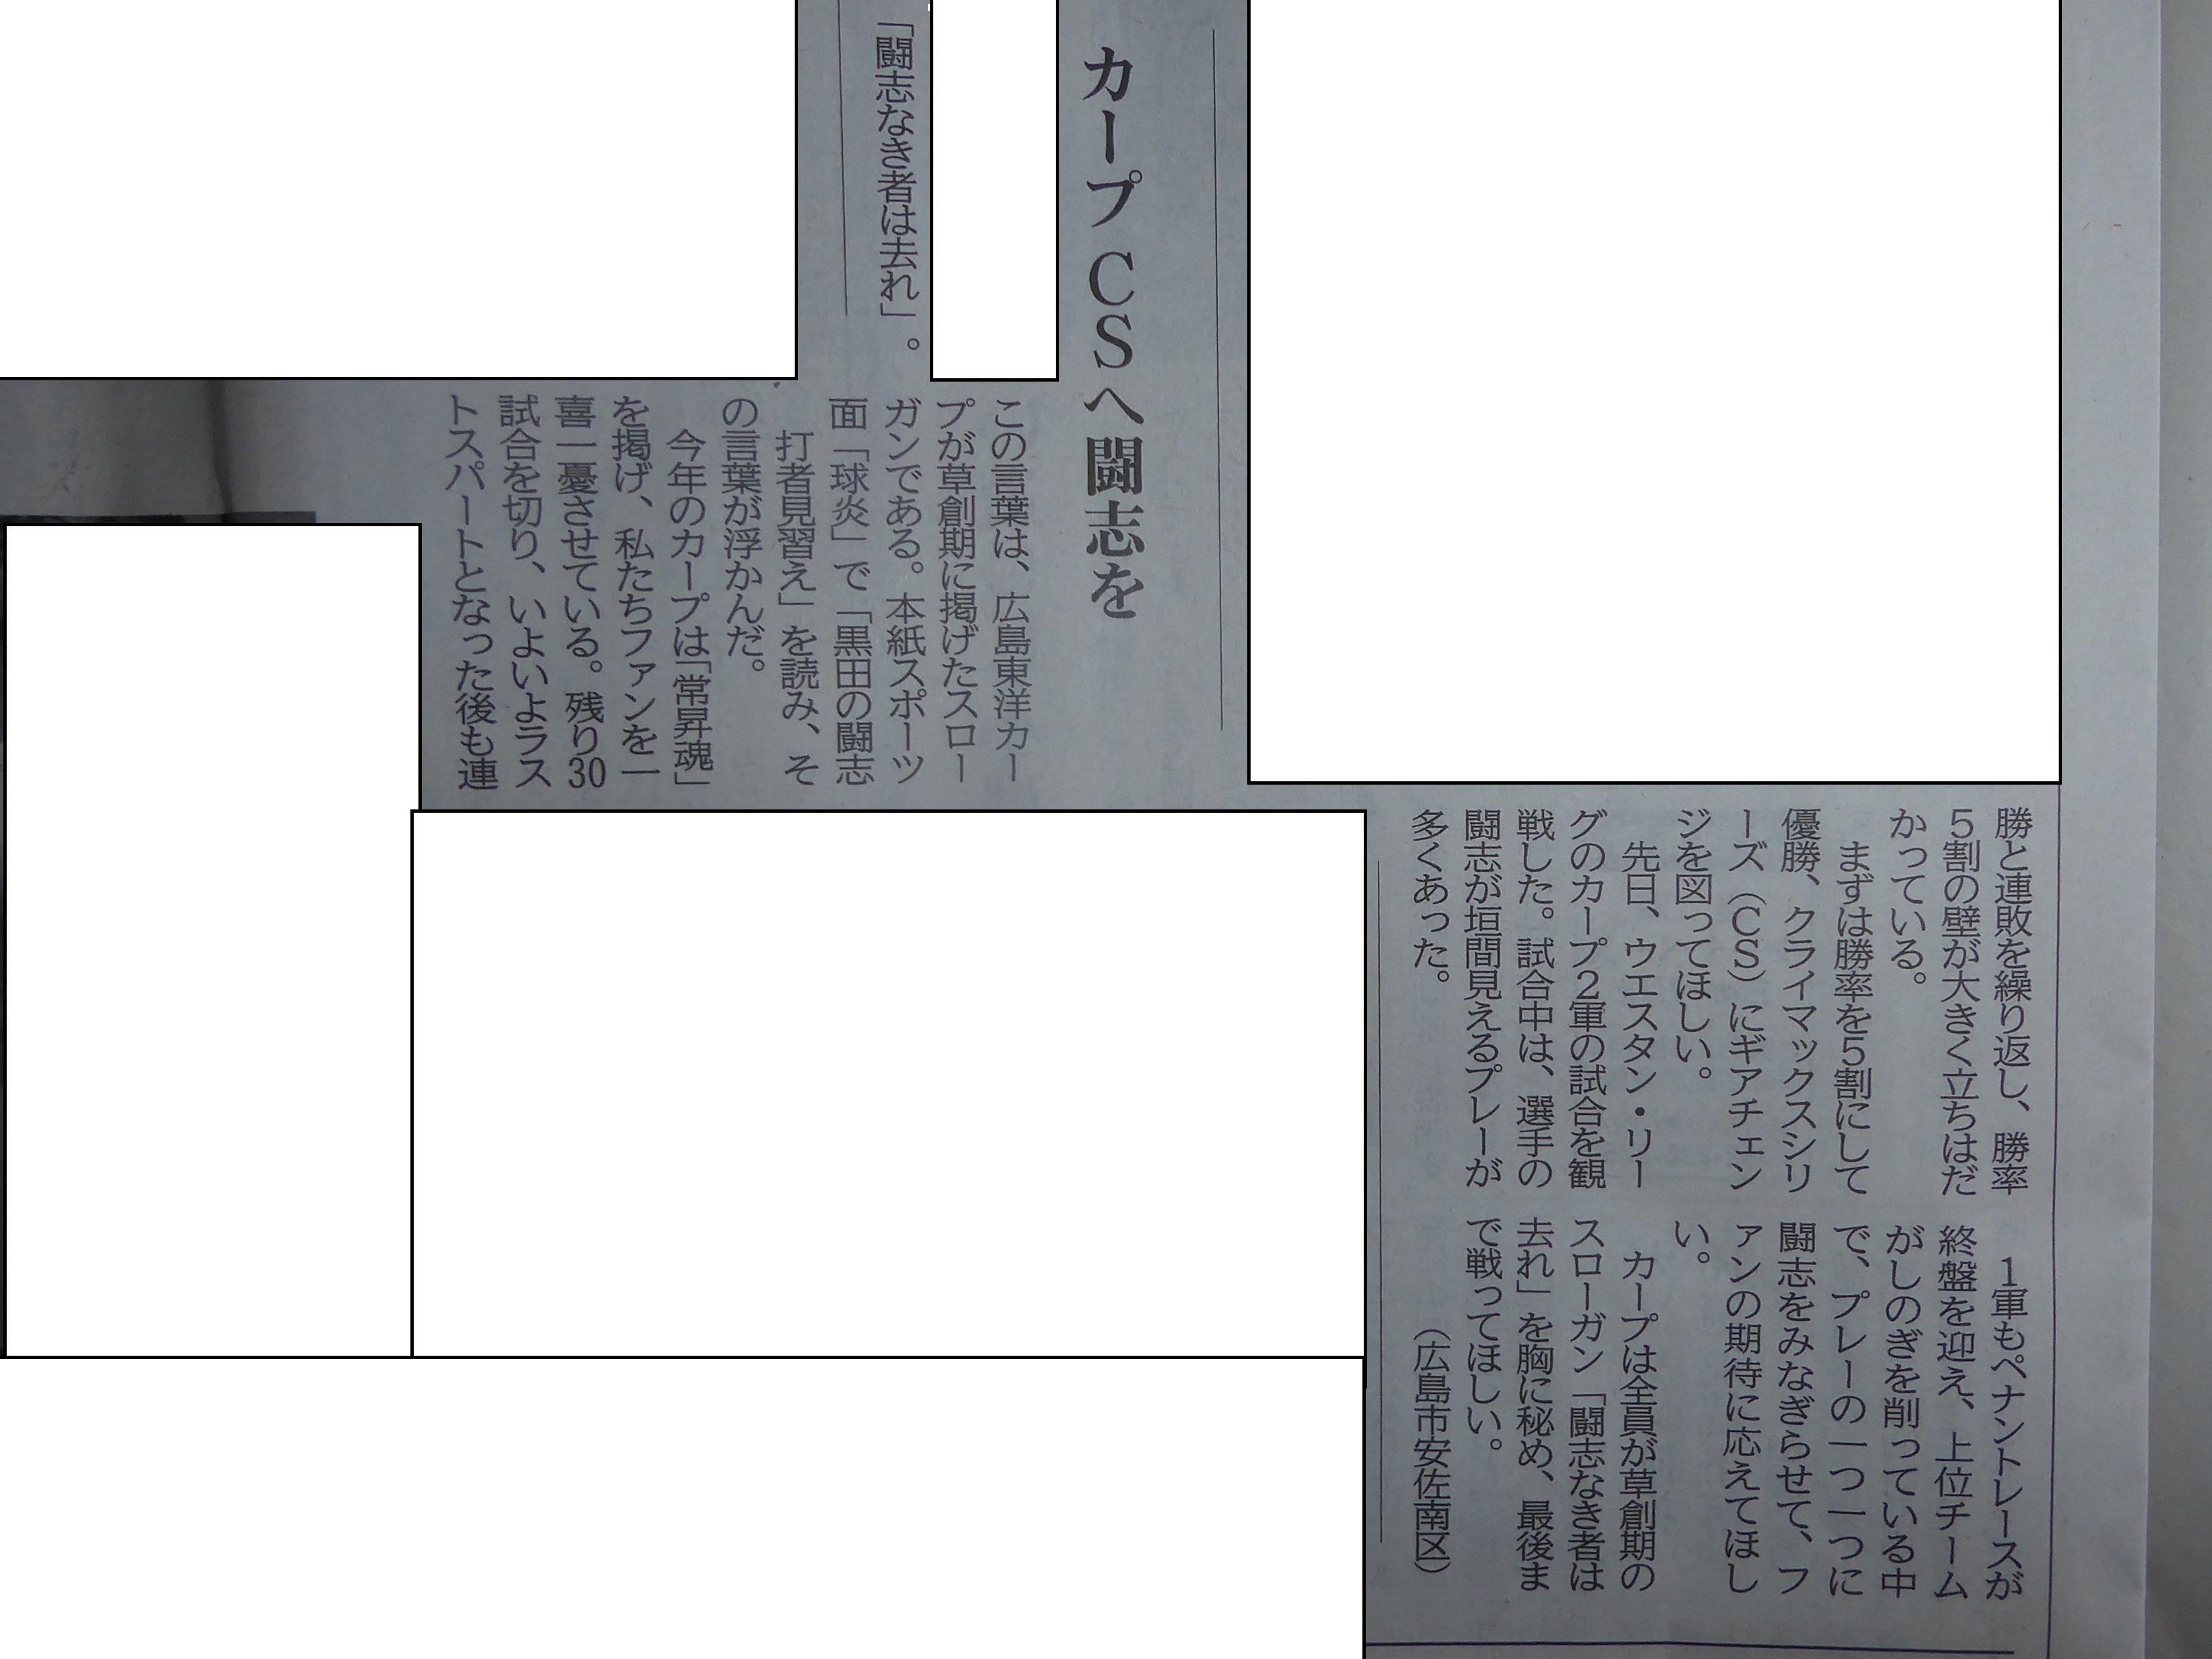 20150911 001